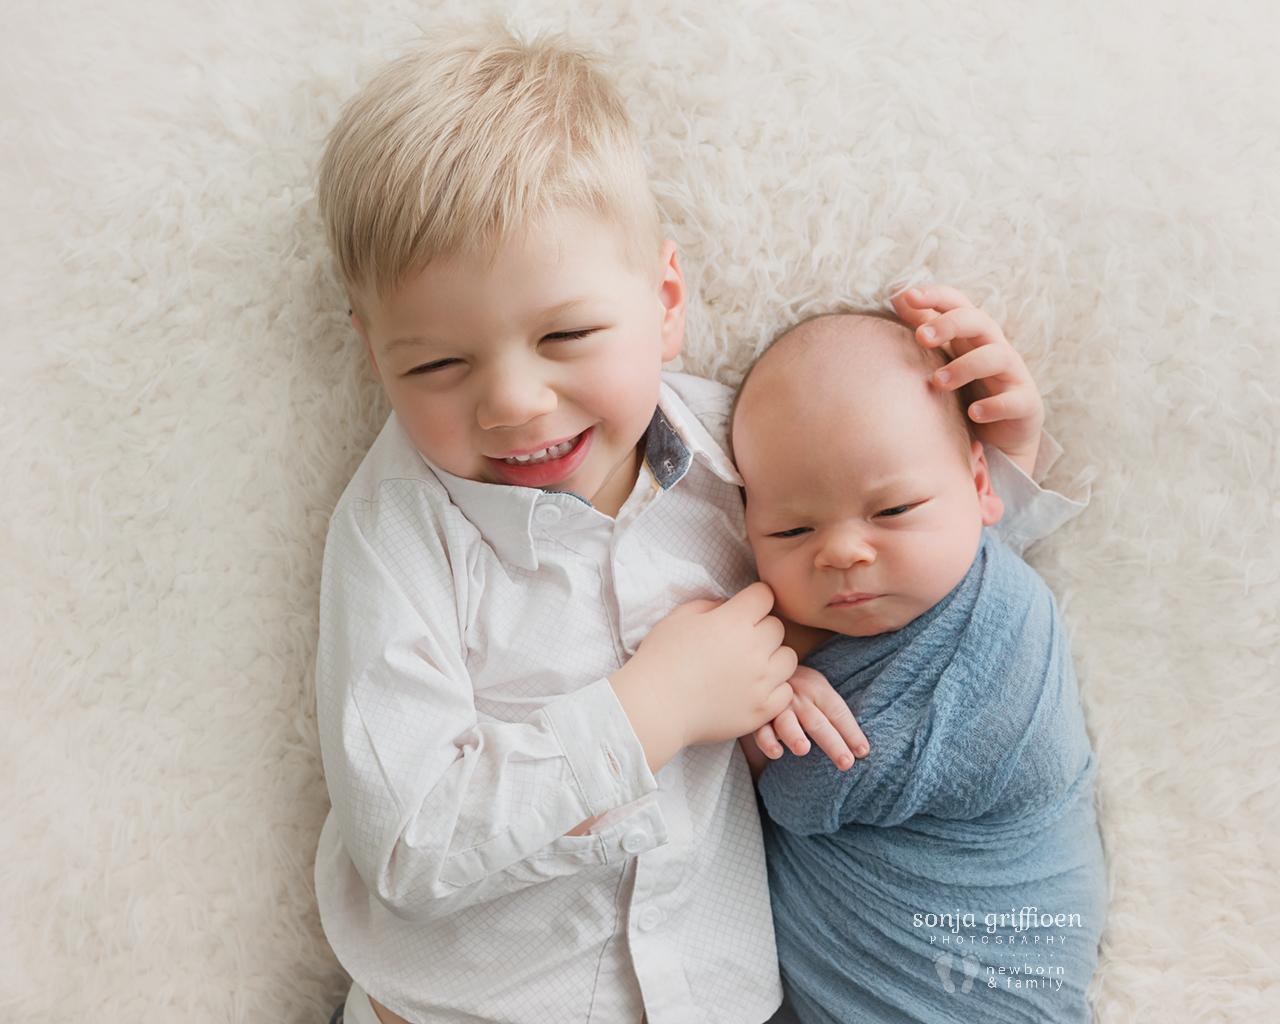 Joshua-Newborn-Brisbane-Newborn-Photographer-Sonja-Griffioen-09.jpg